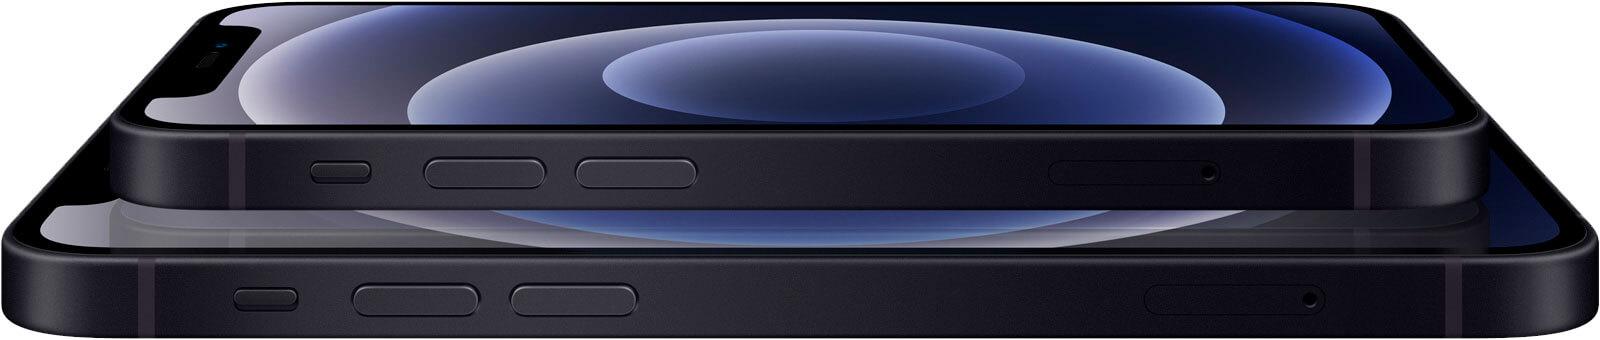 Nuevo iPhone 12 Negro Barato